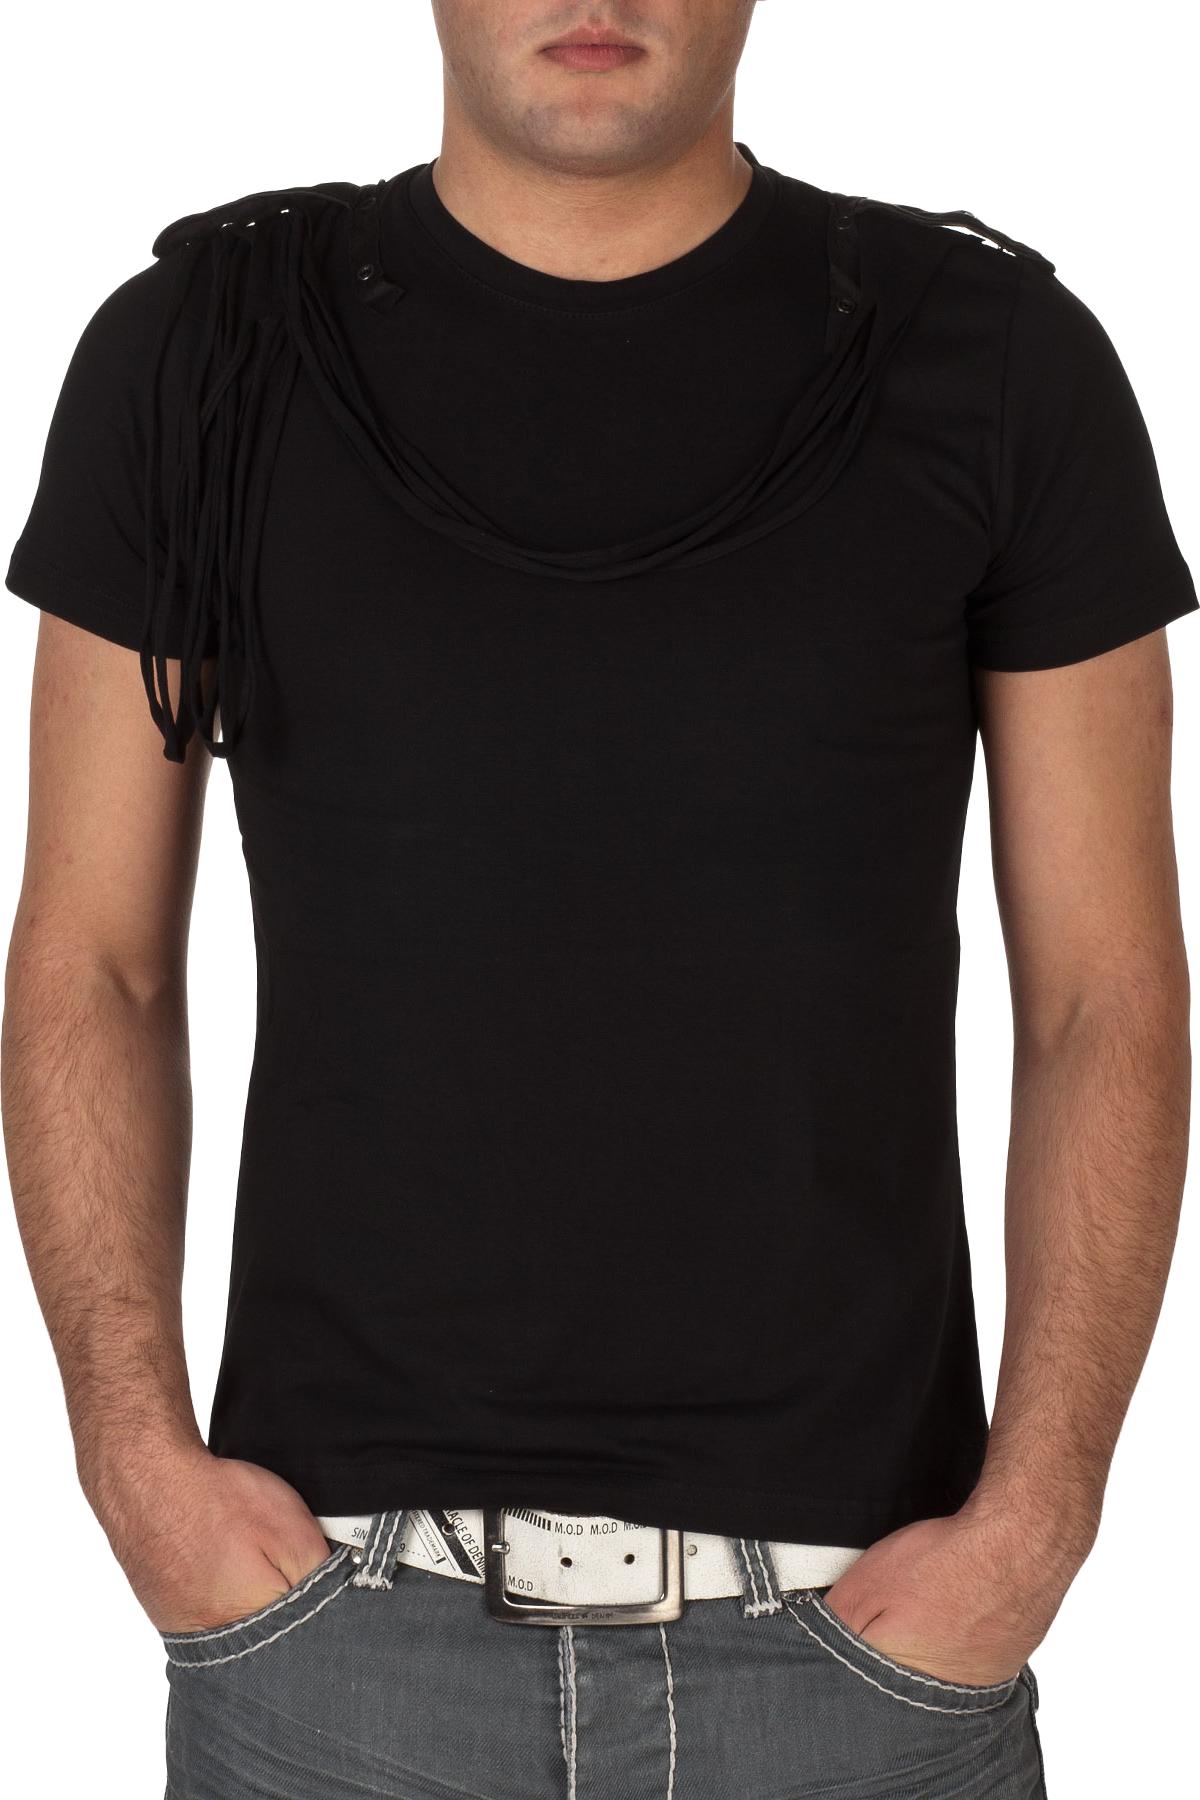 Black Men's Polo Shirt PNG Image.